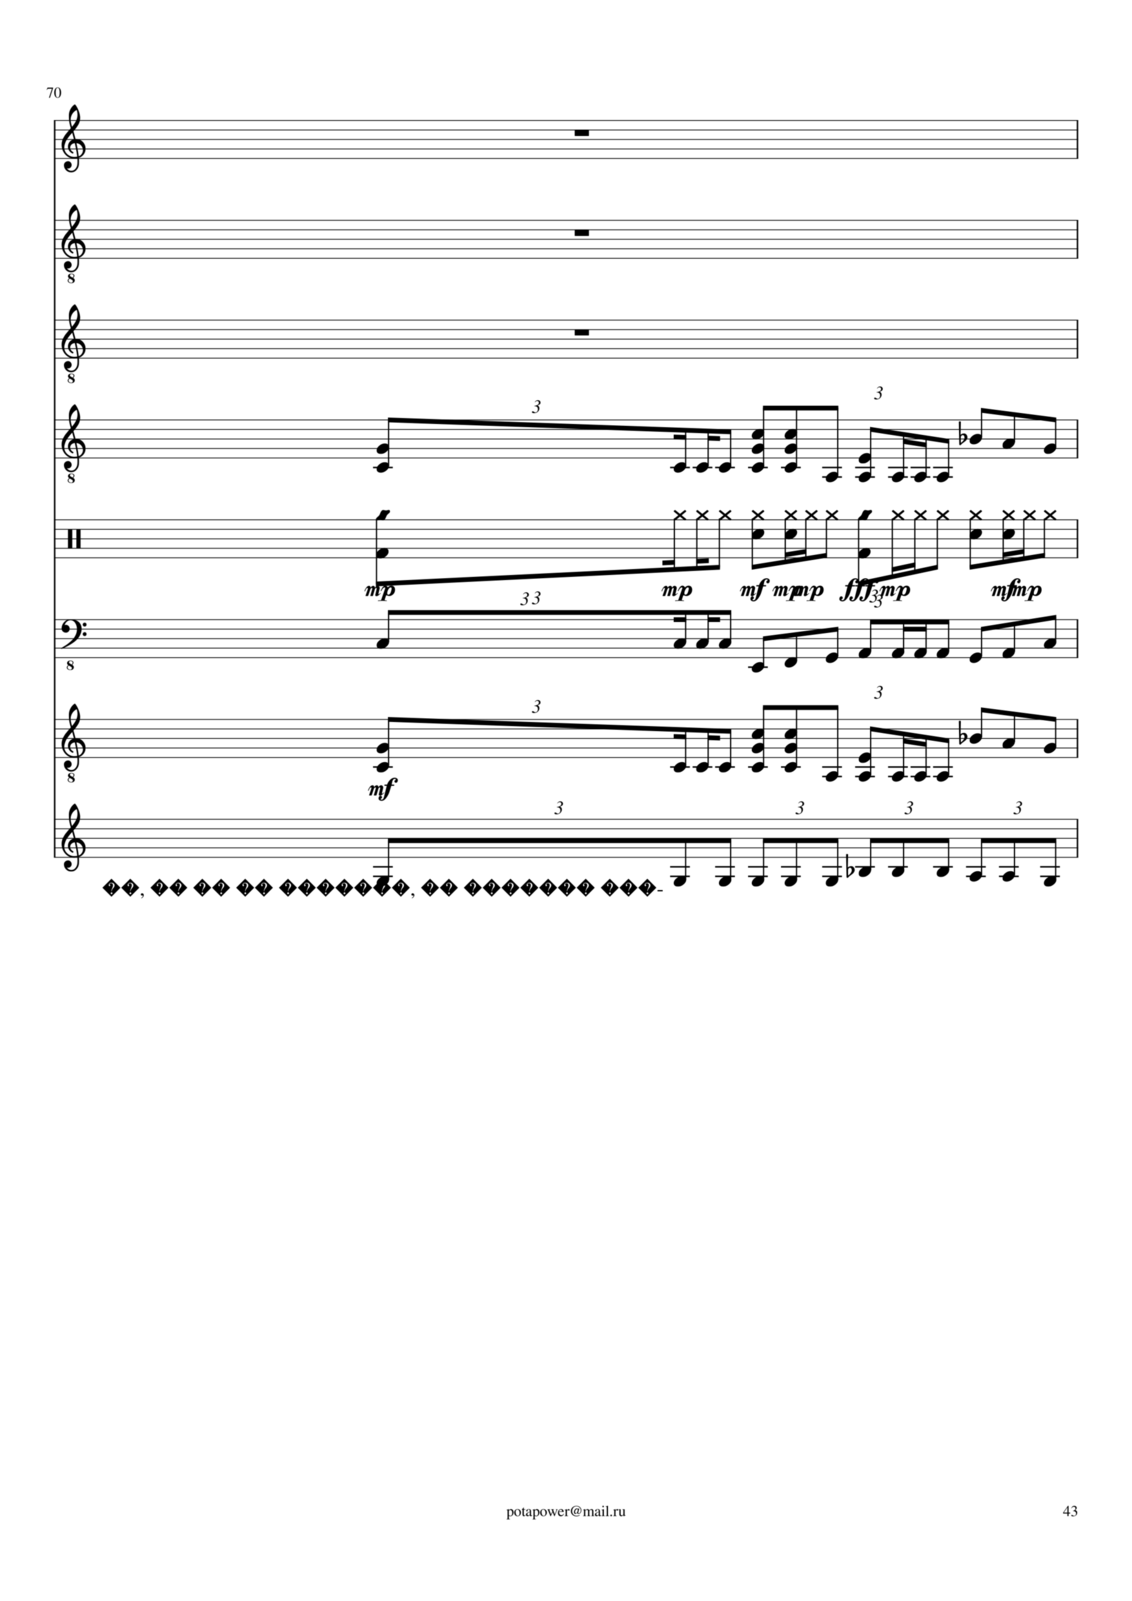 Korolevstvo slez slide, Image 43